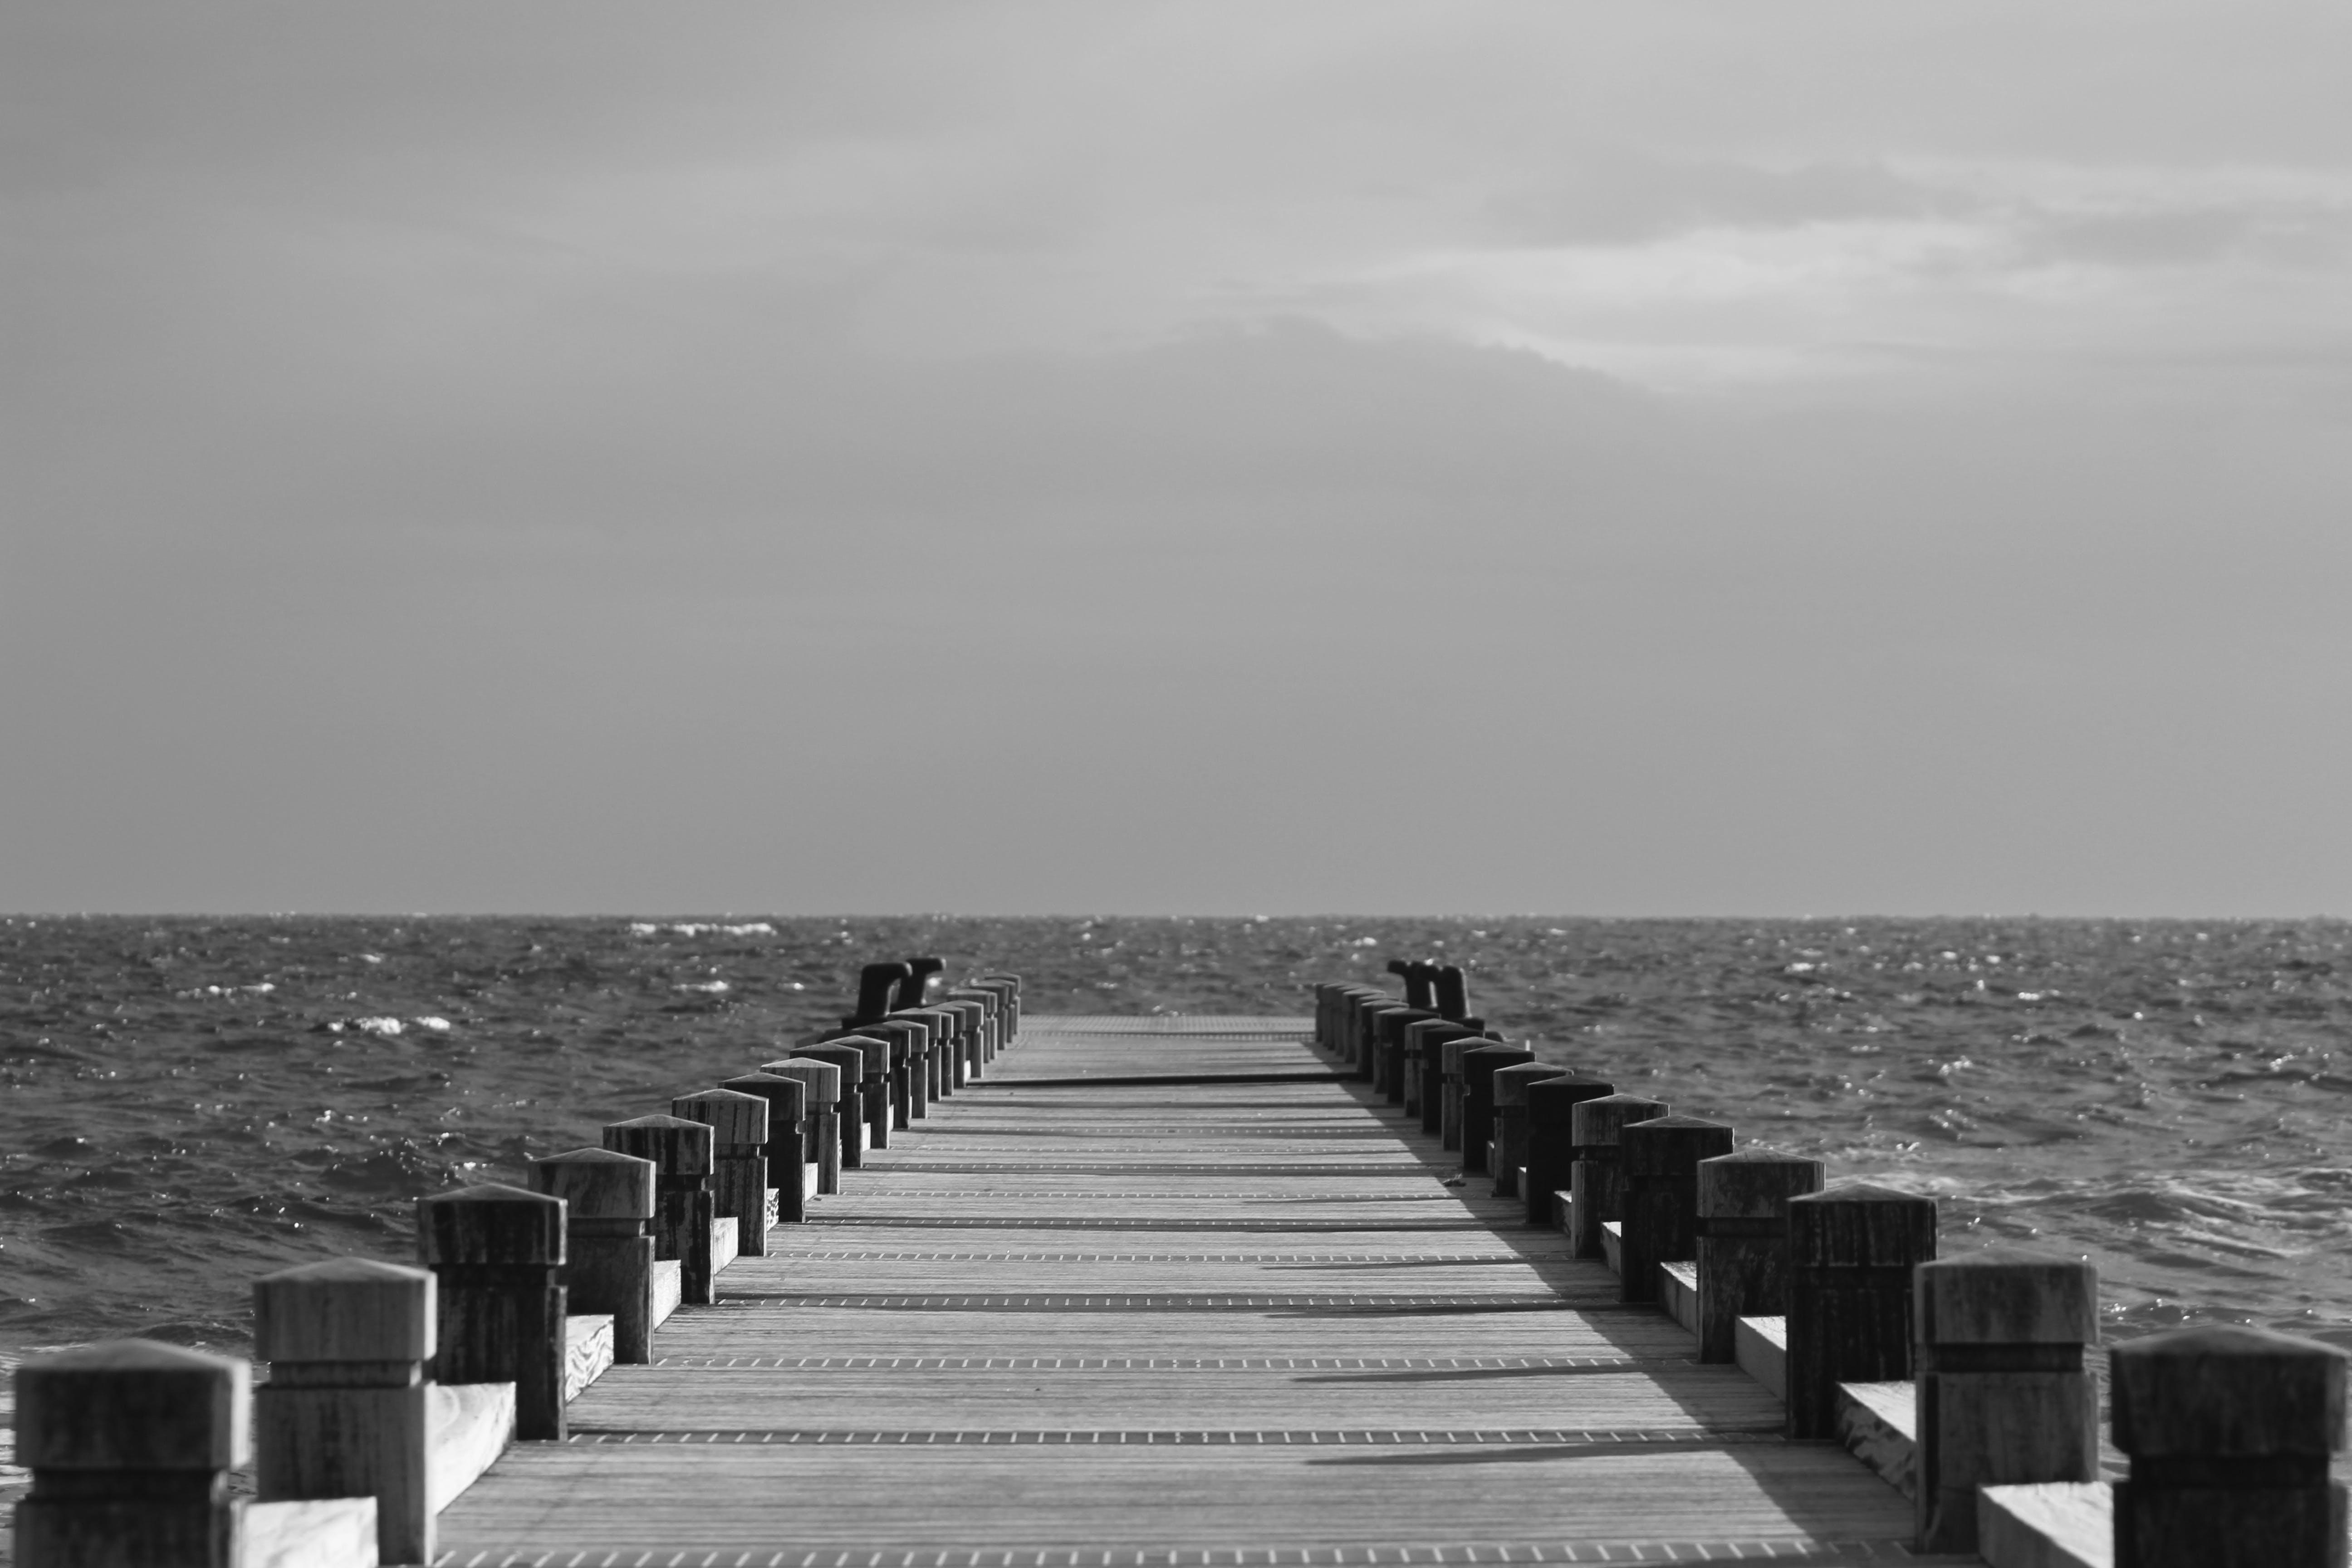 beach, black-and-white, boardwalk